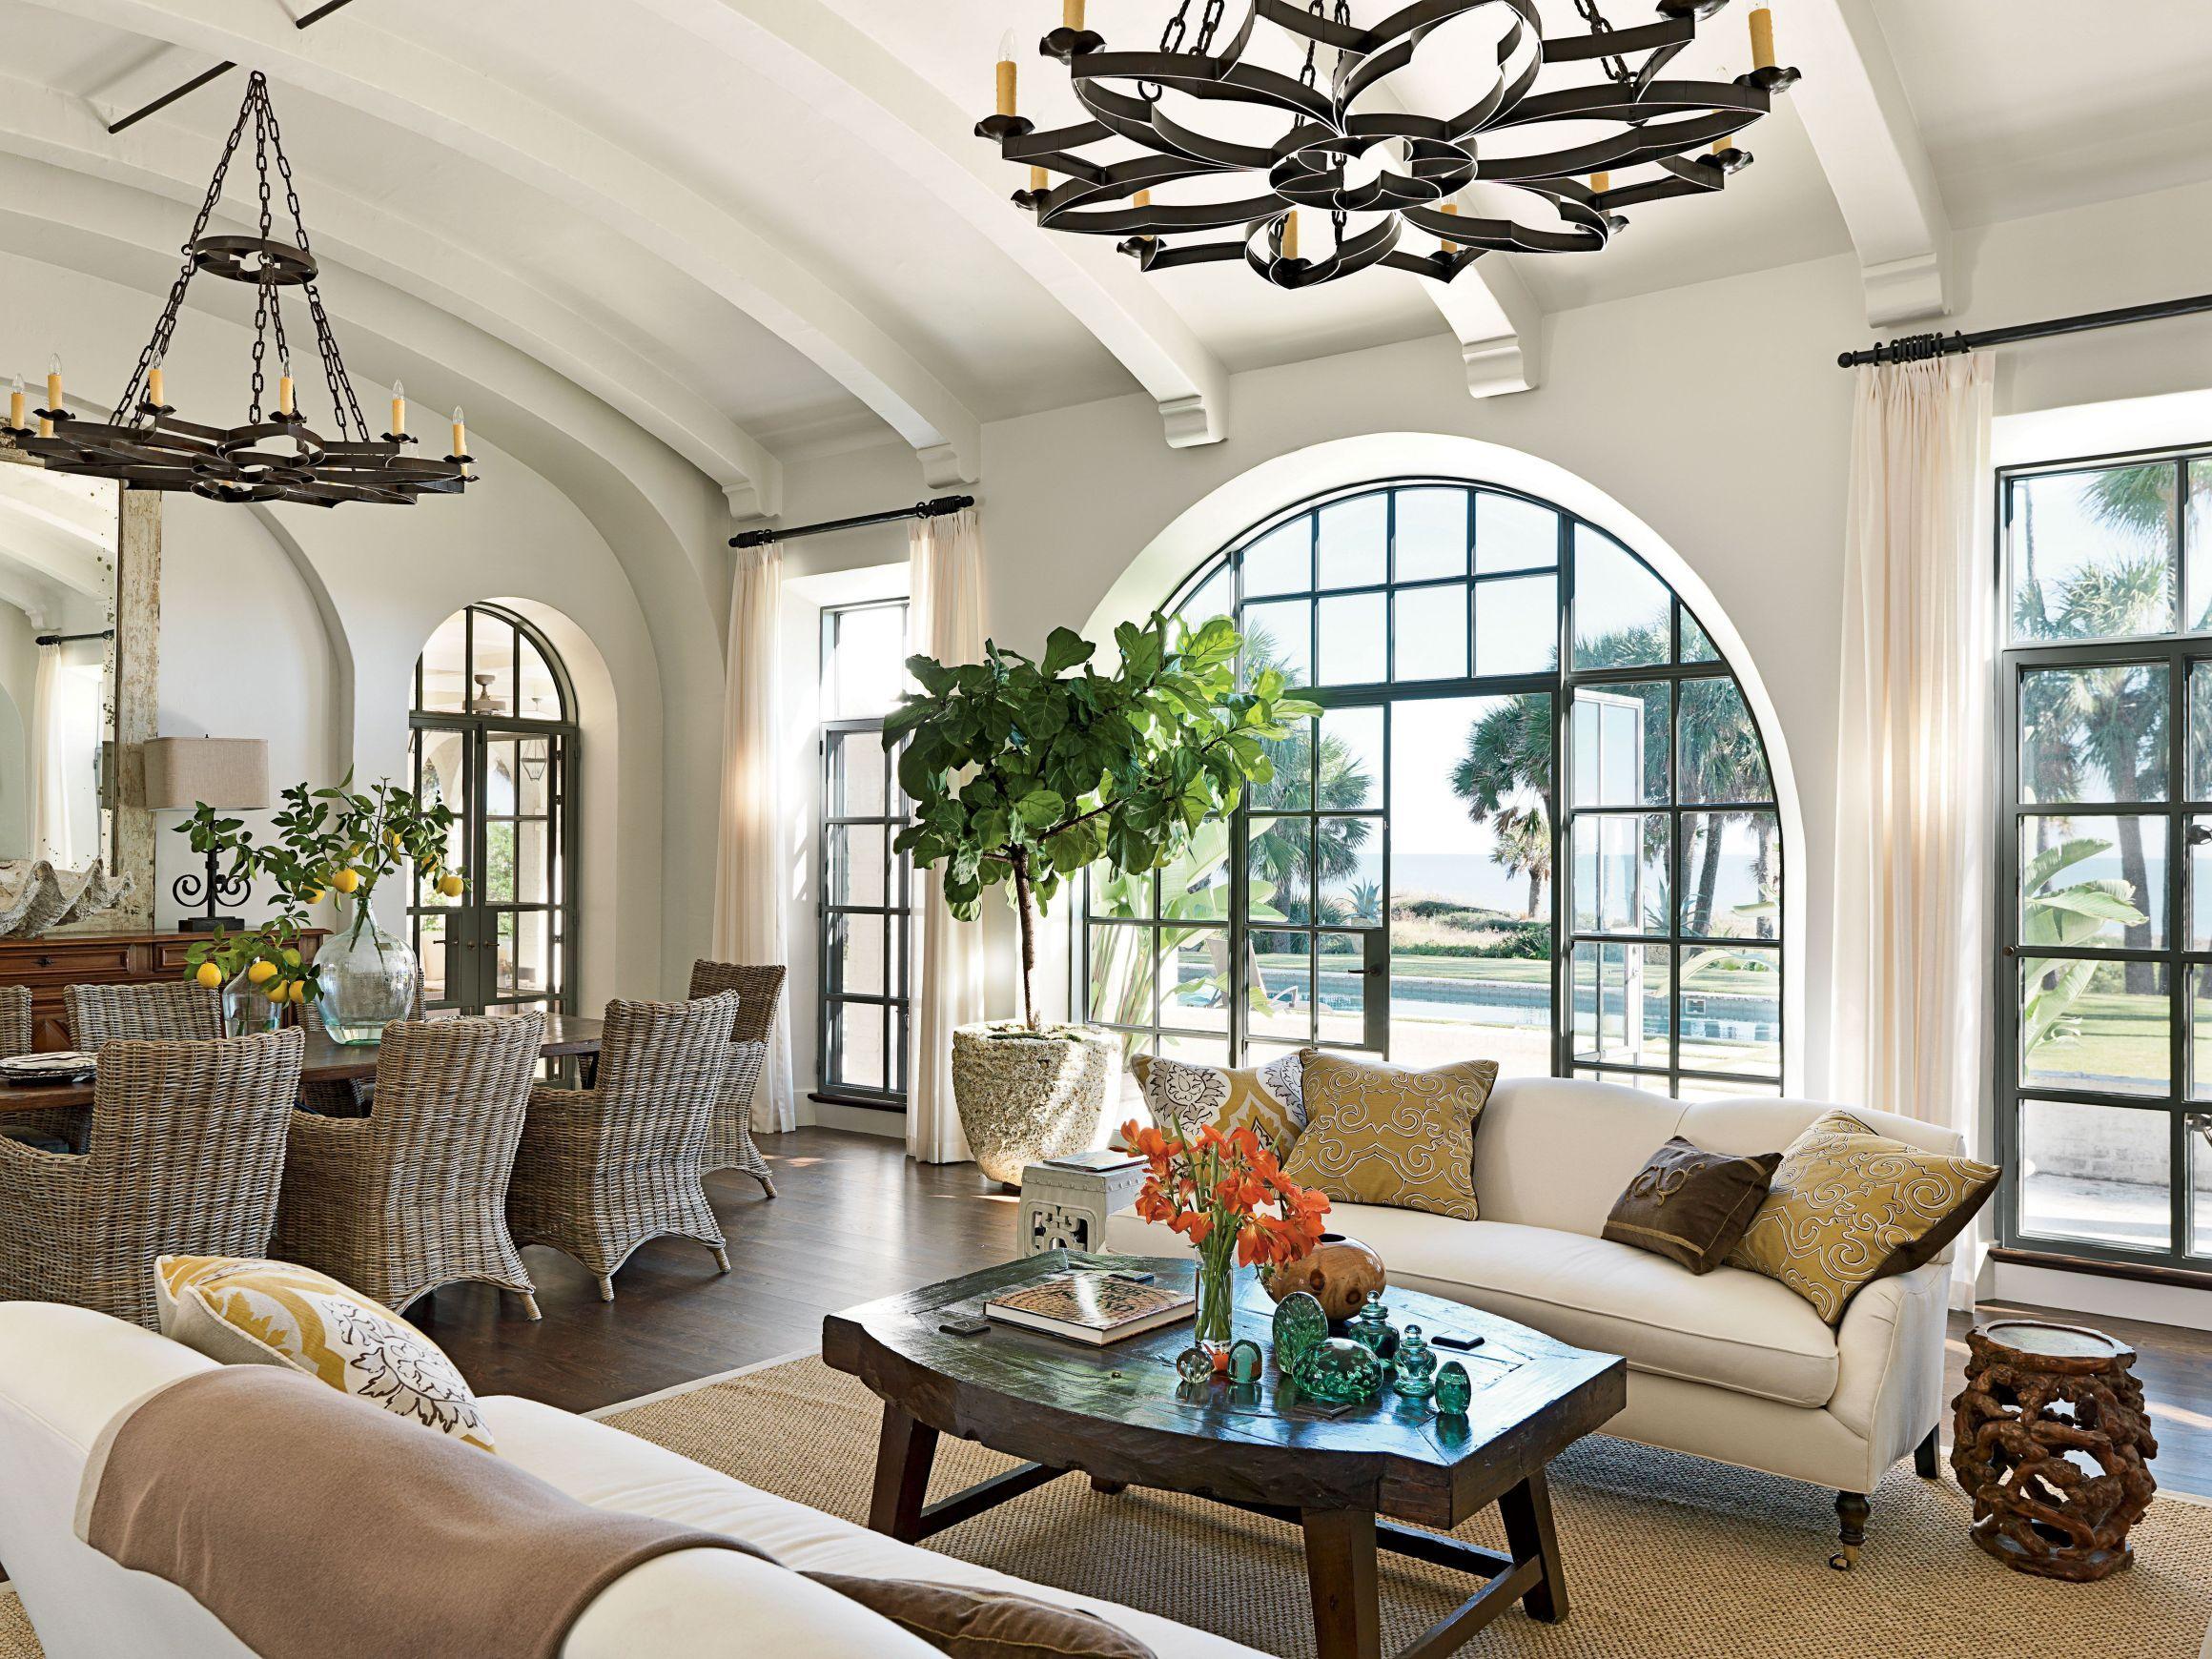 Spanish Style Living Room Ideas Spanish Home Decor Spanish